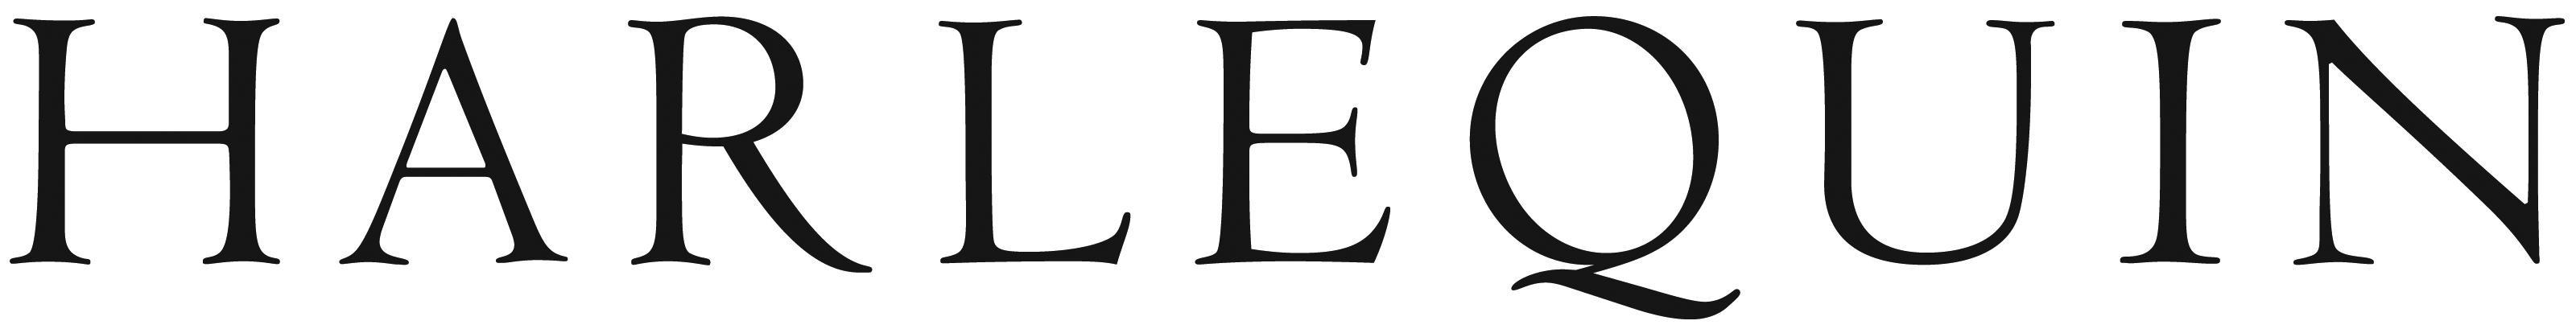 harlequin_logo_1_1